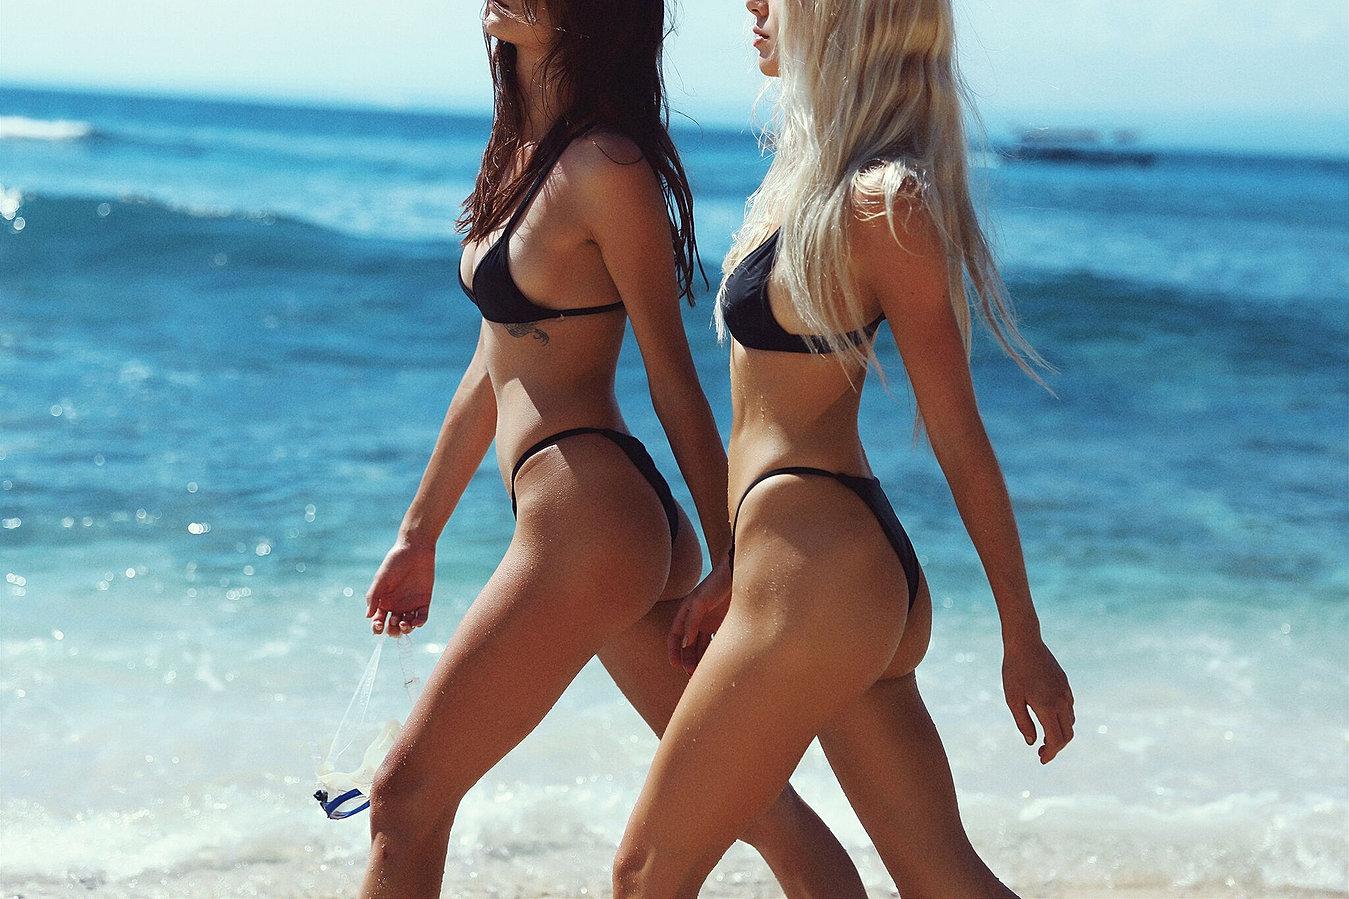 Видео две девушки на пляже какие